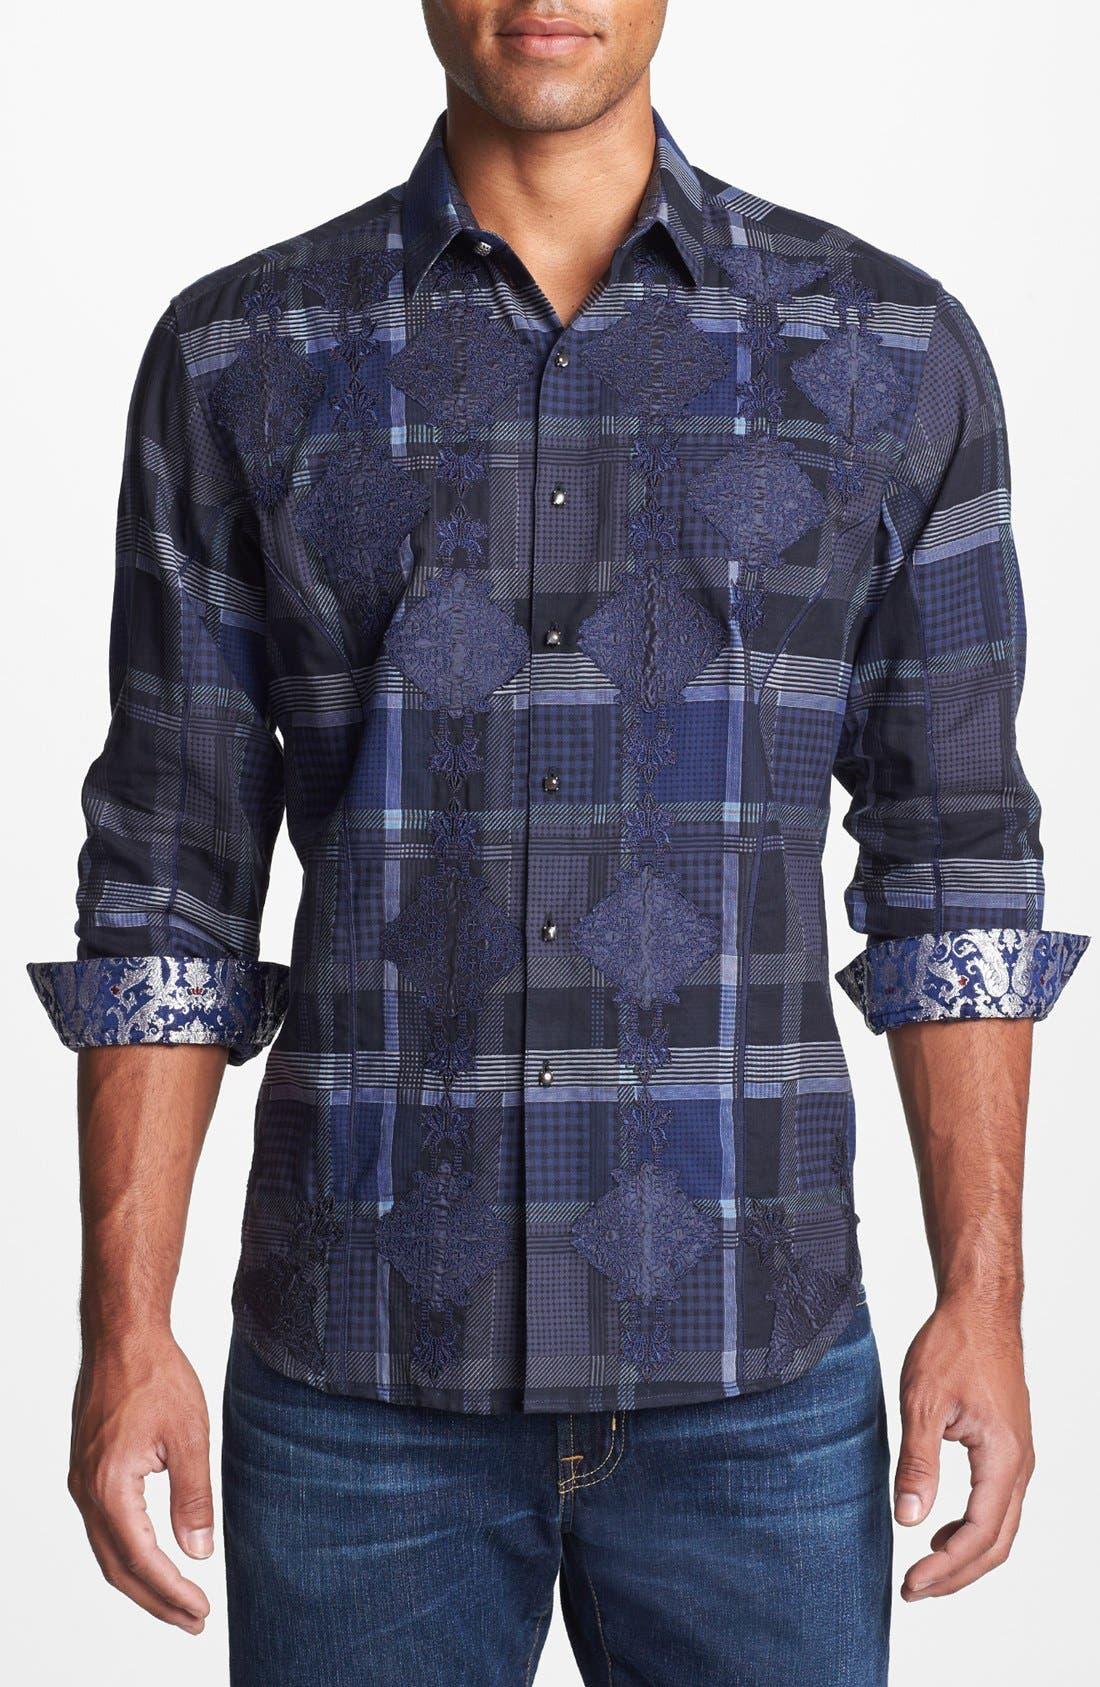 Alternate Image 1 Selected - Robert Graham 'Malachite' Regular Fit Sport Shirt (Limited Edition)